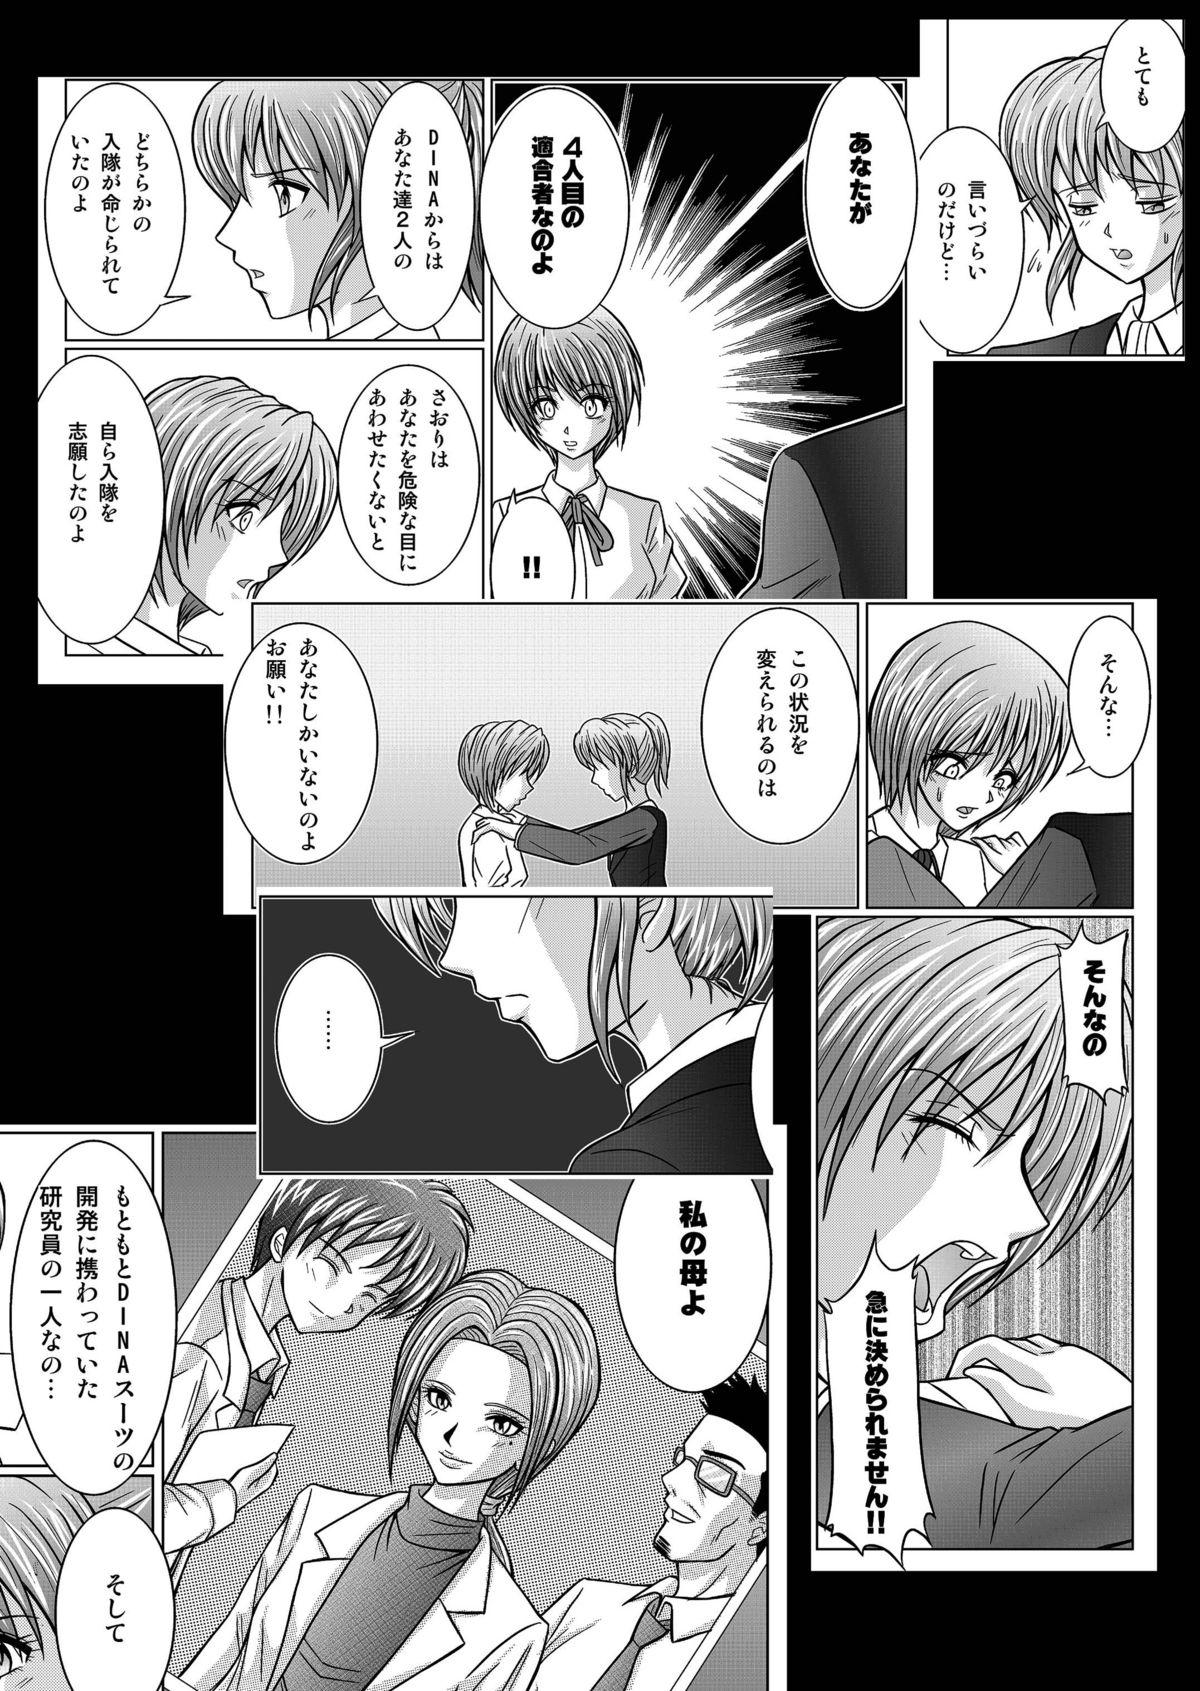 [Macxe's (monmon)] Tokubousentai Dinaranger ~Heroine Kairaku Sennou Keikaku~ Vol.01/02/03 (Renkaban) [Digital] 127